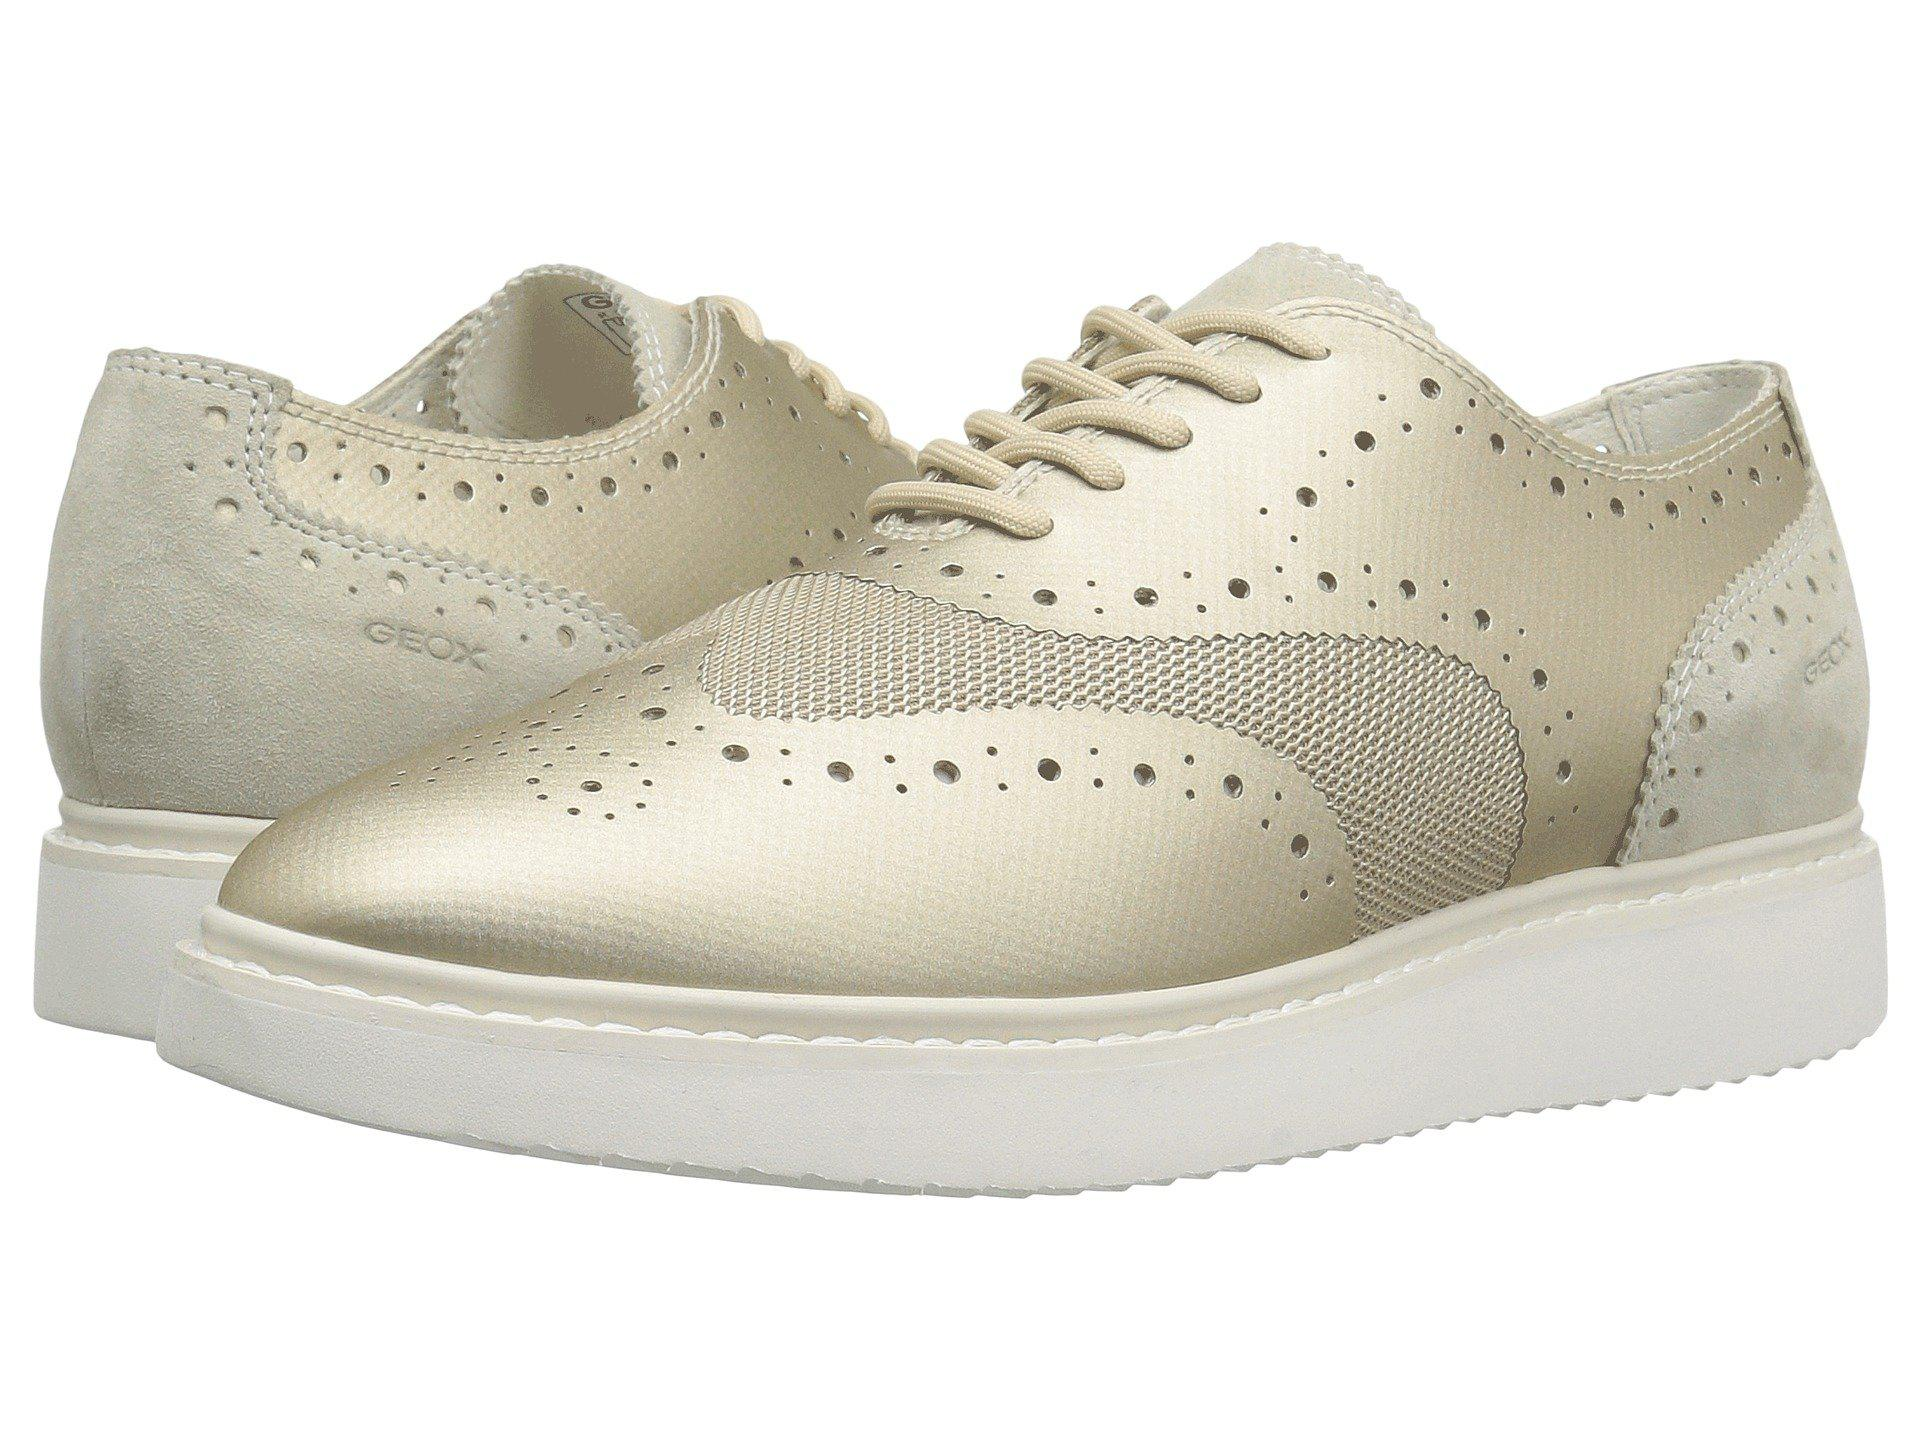 238bb2faf5a6 Lyst - Geox D Thymar Fashion Sneaker in Metallic - Save 50%